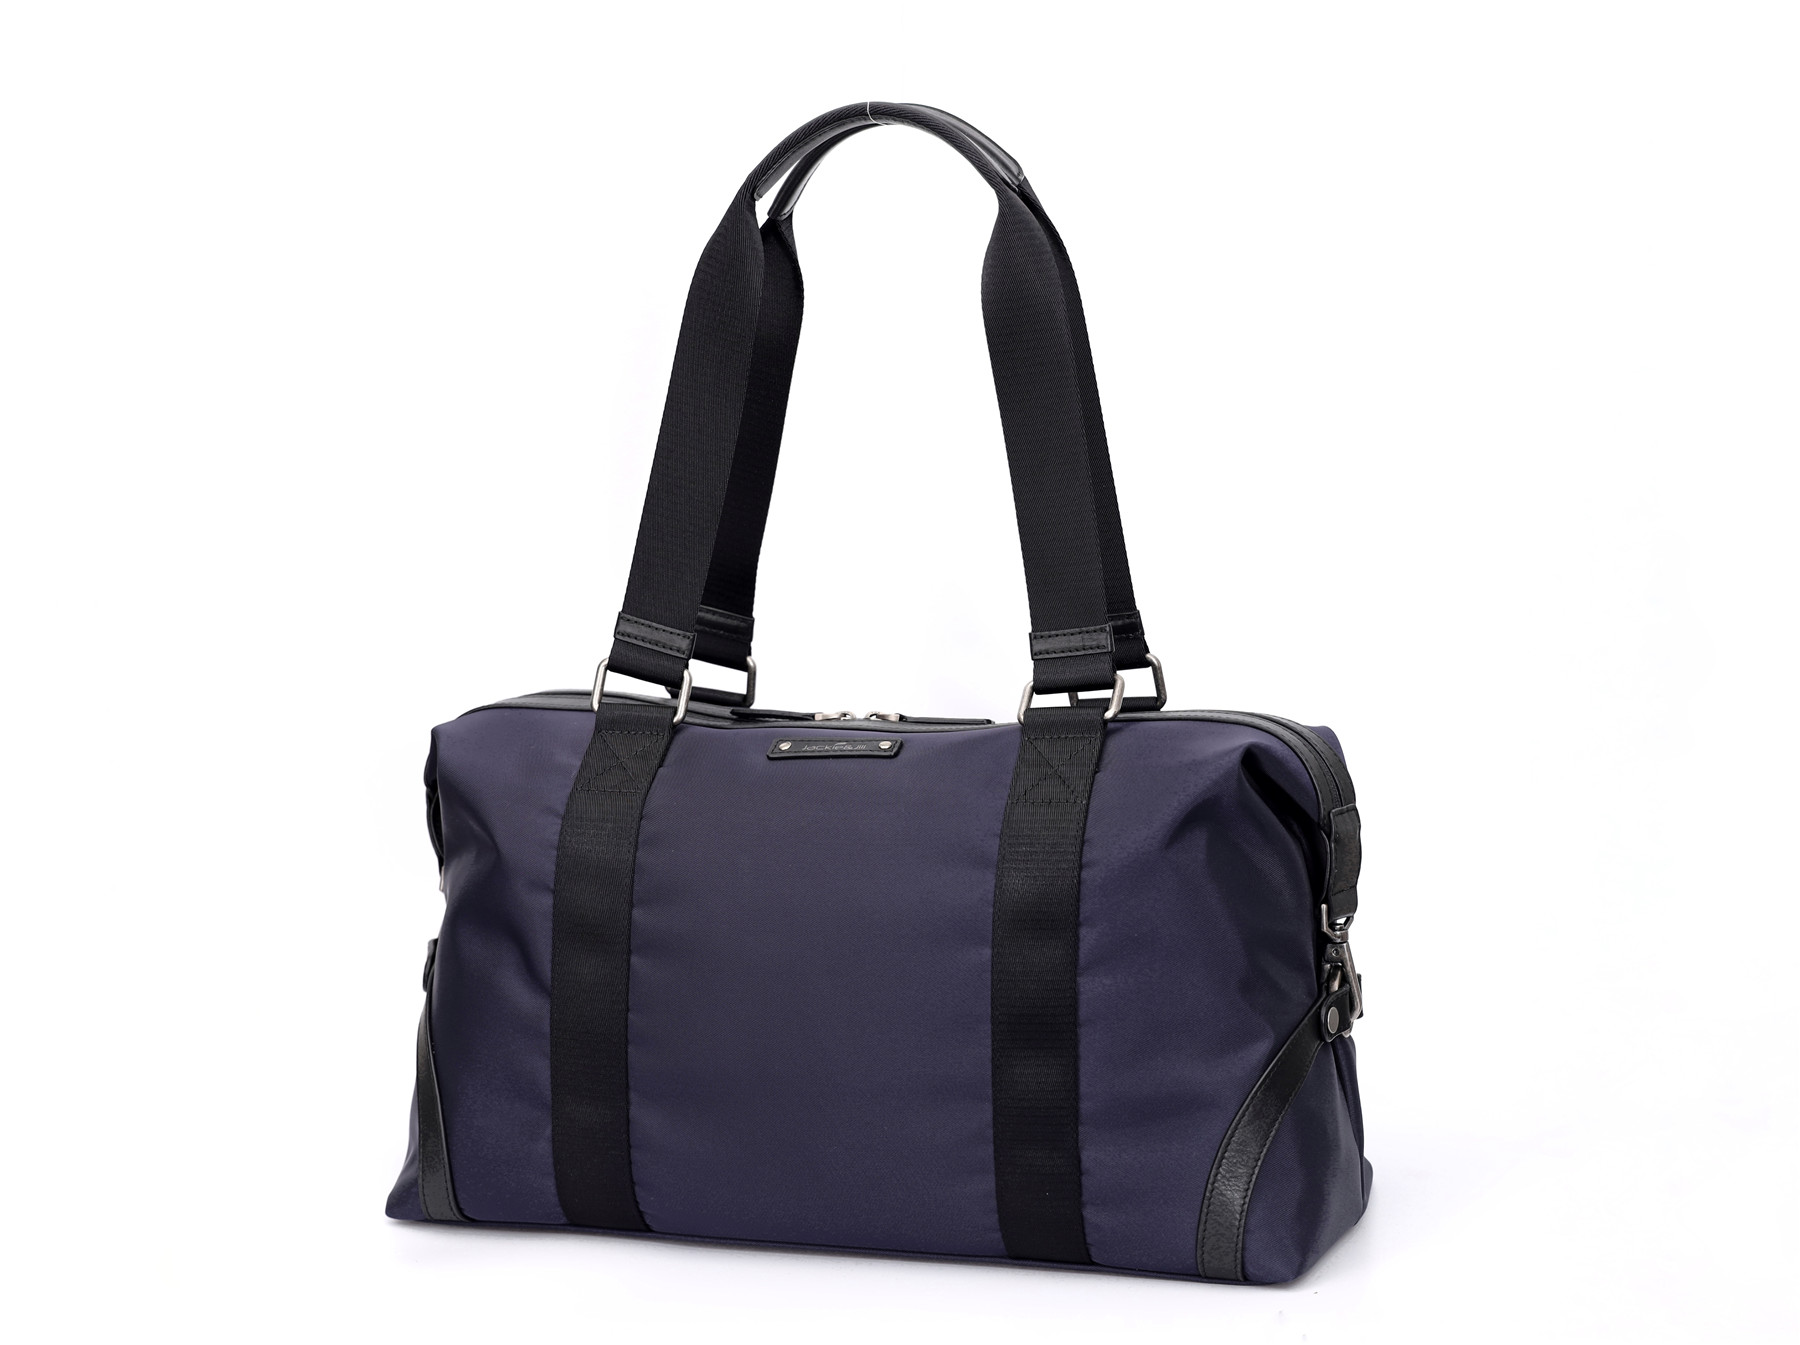 GF bags-Oem Mens Overnight Bag Manufacturer   Duffle-1